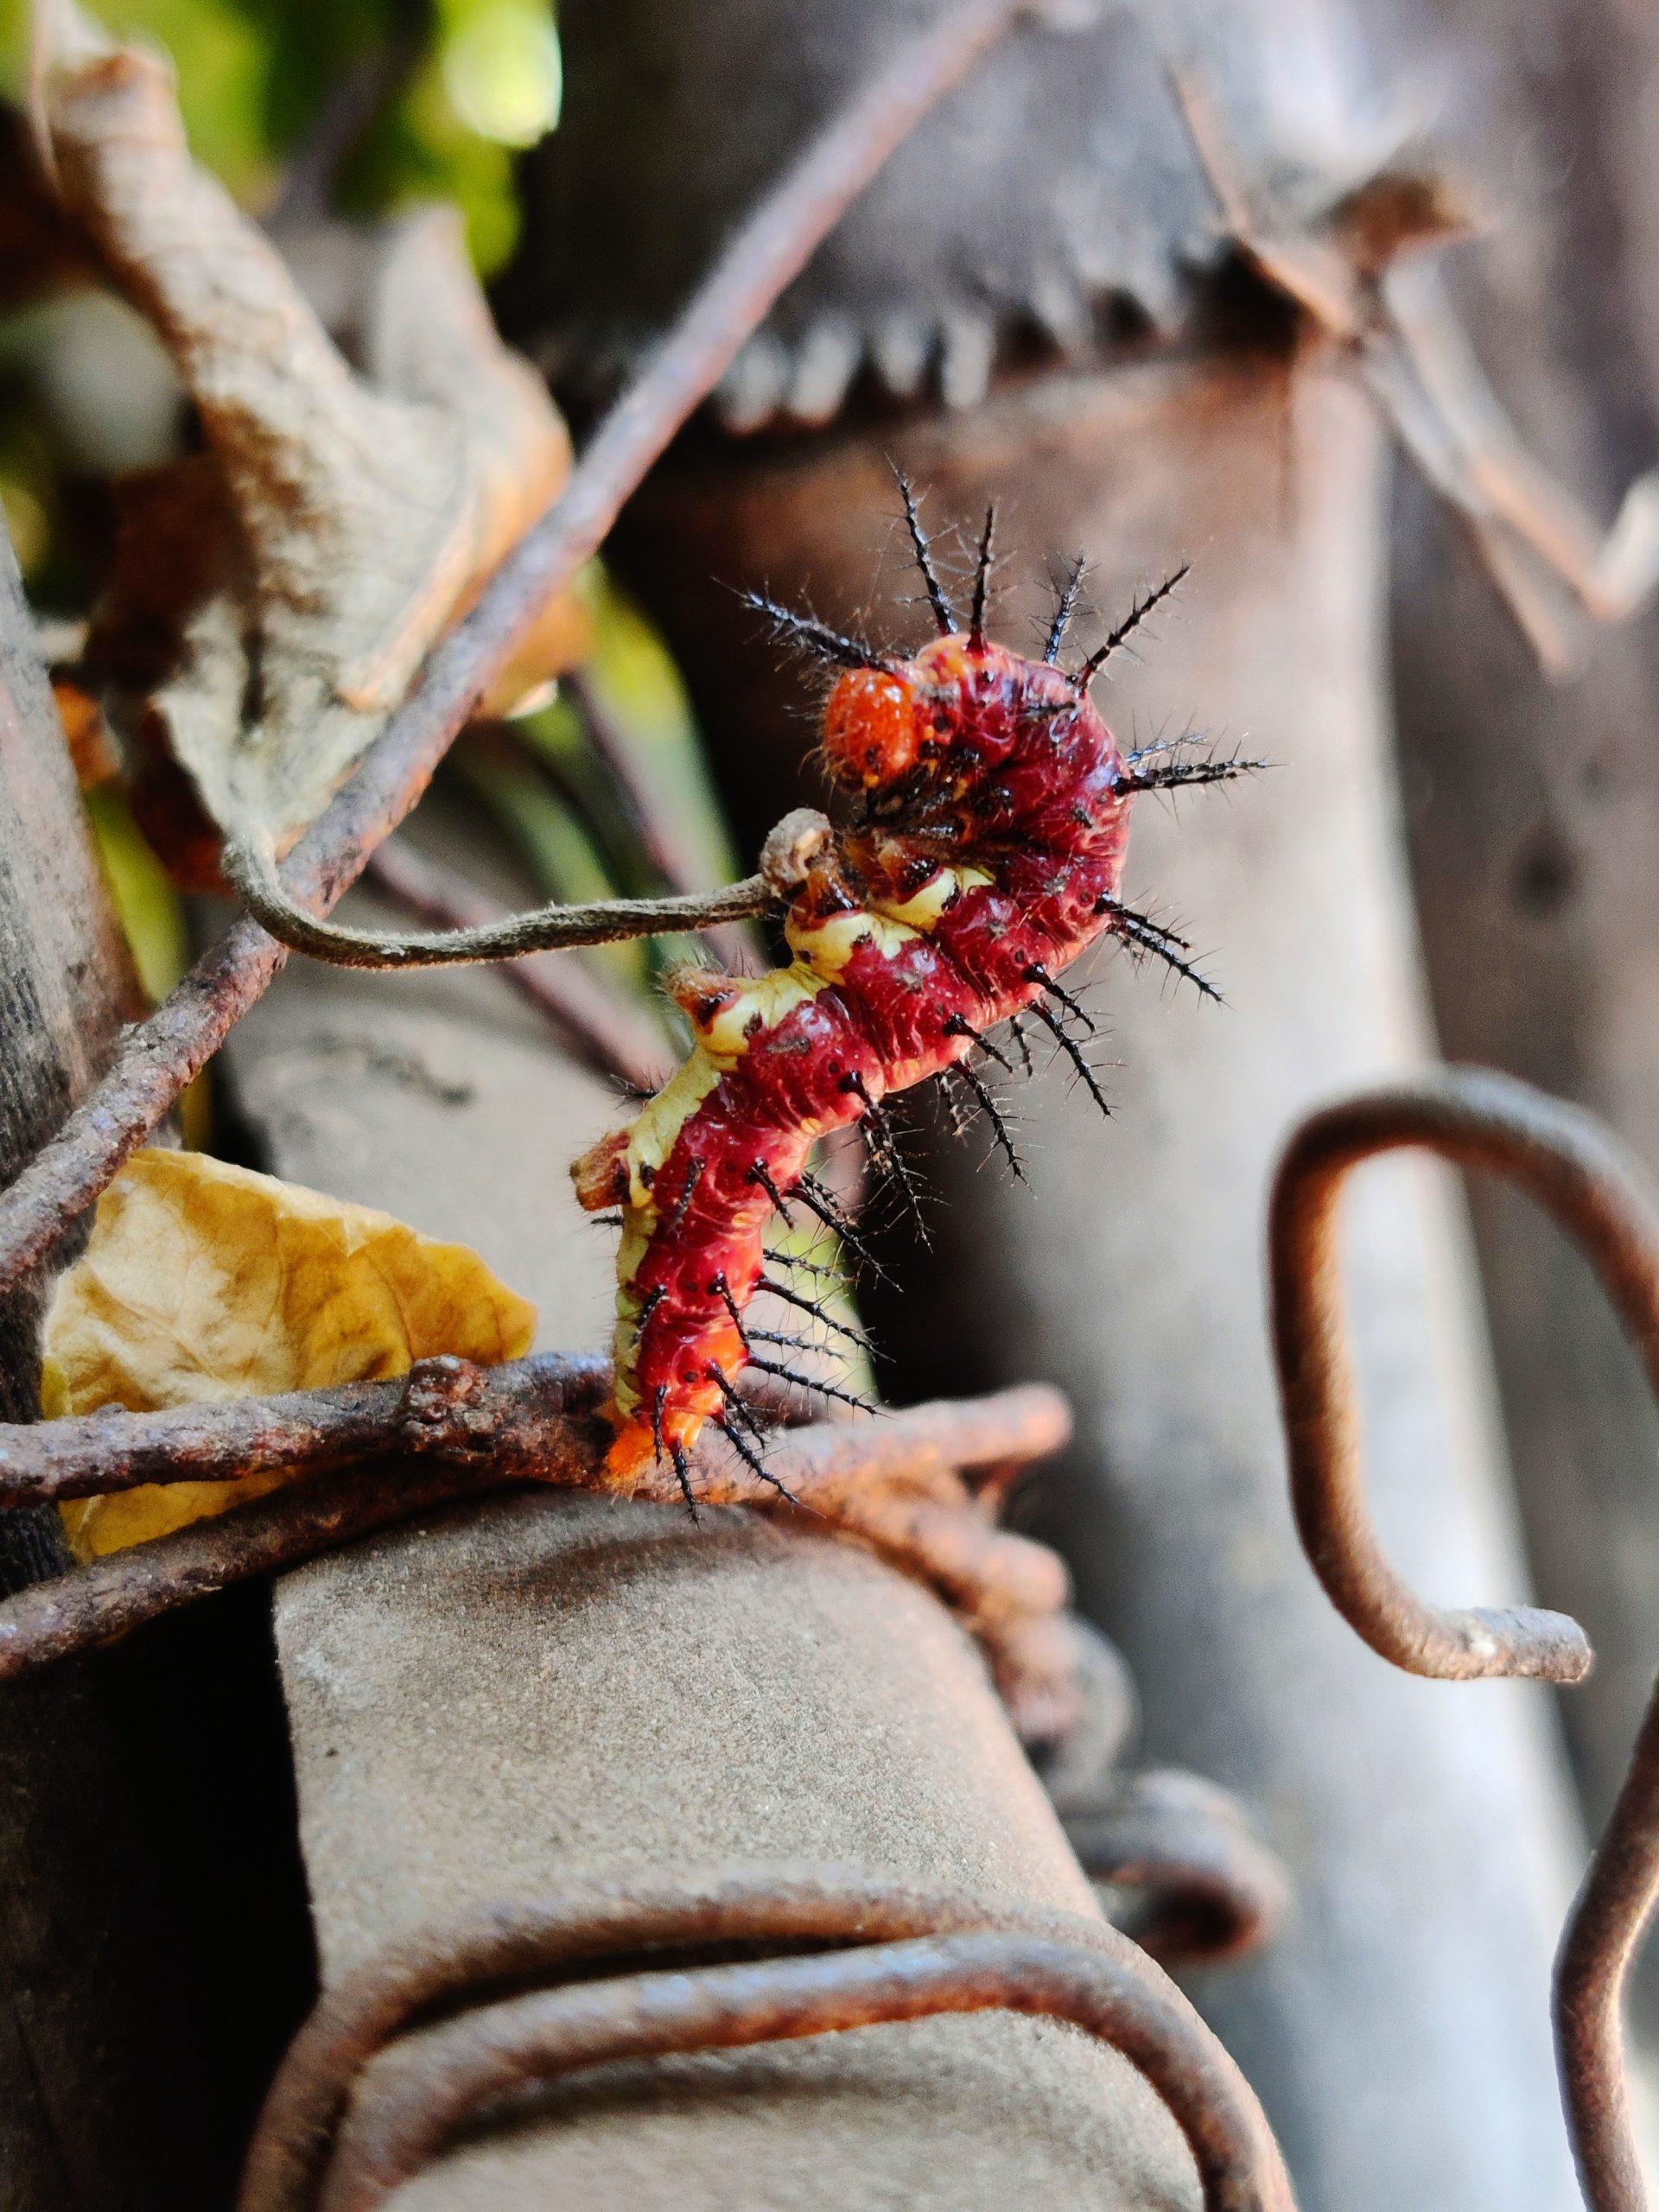 A thorny worm